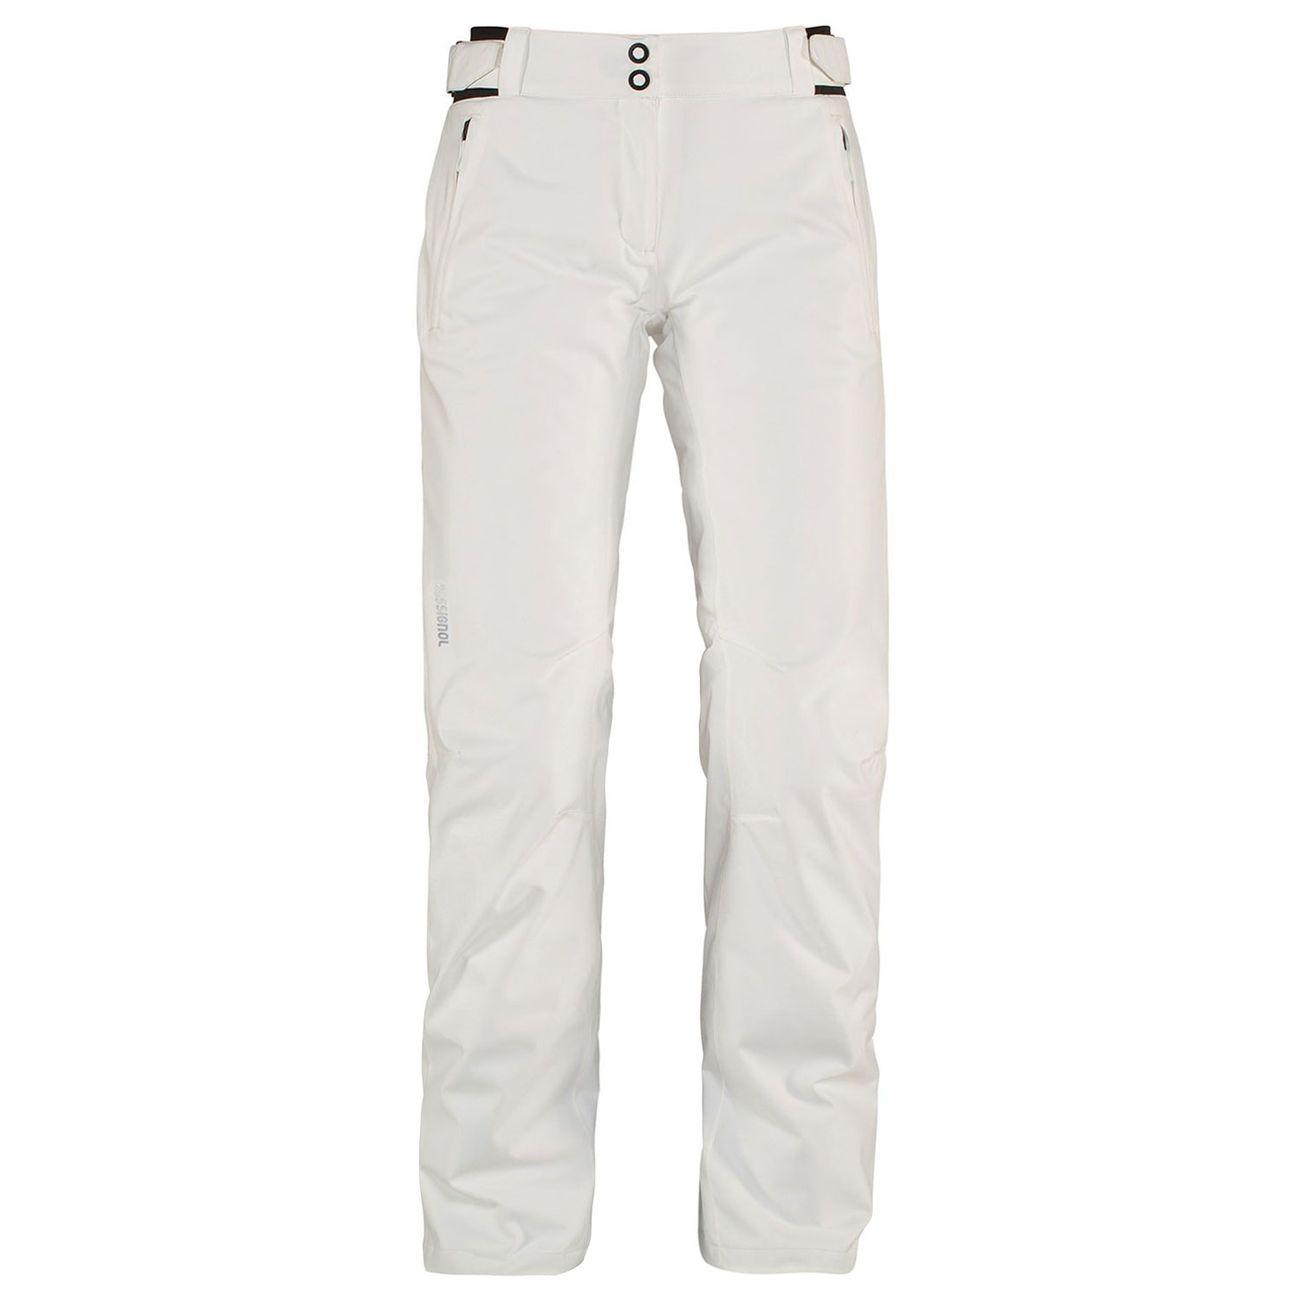 ROSSIGNOL Ski Pantalon Ski Femme – achat et prix pas cher - Go Sport 91ee297237a